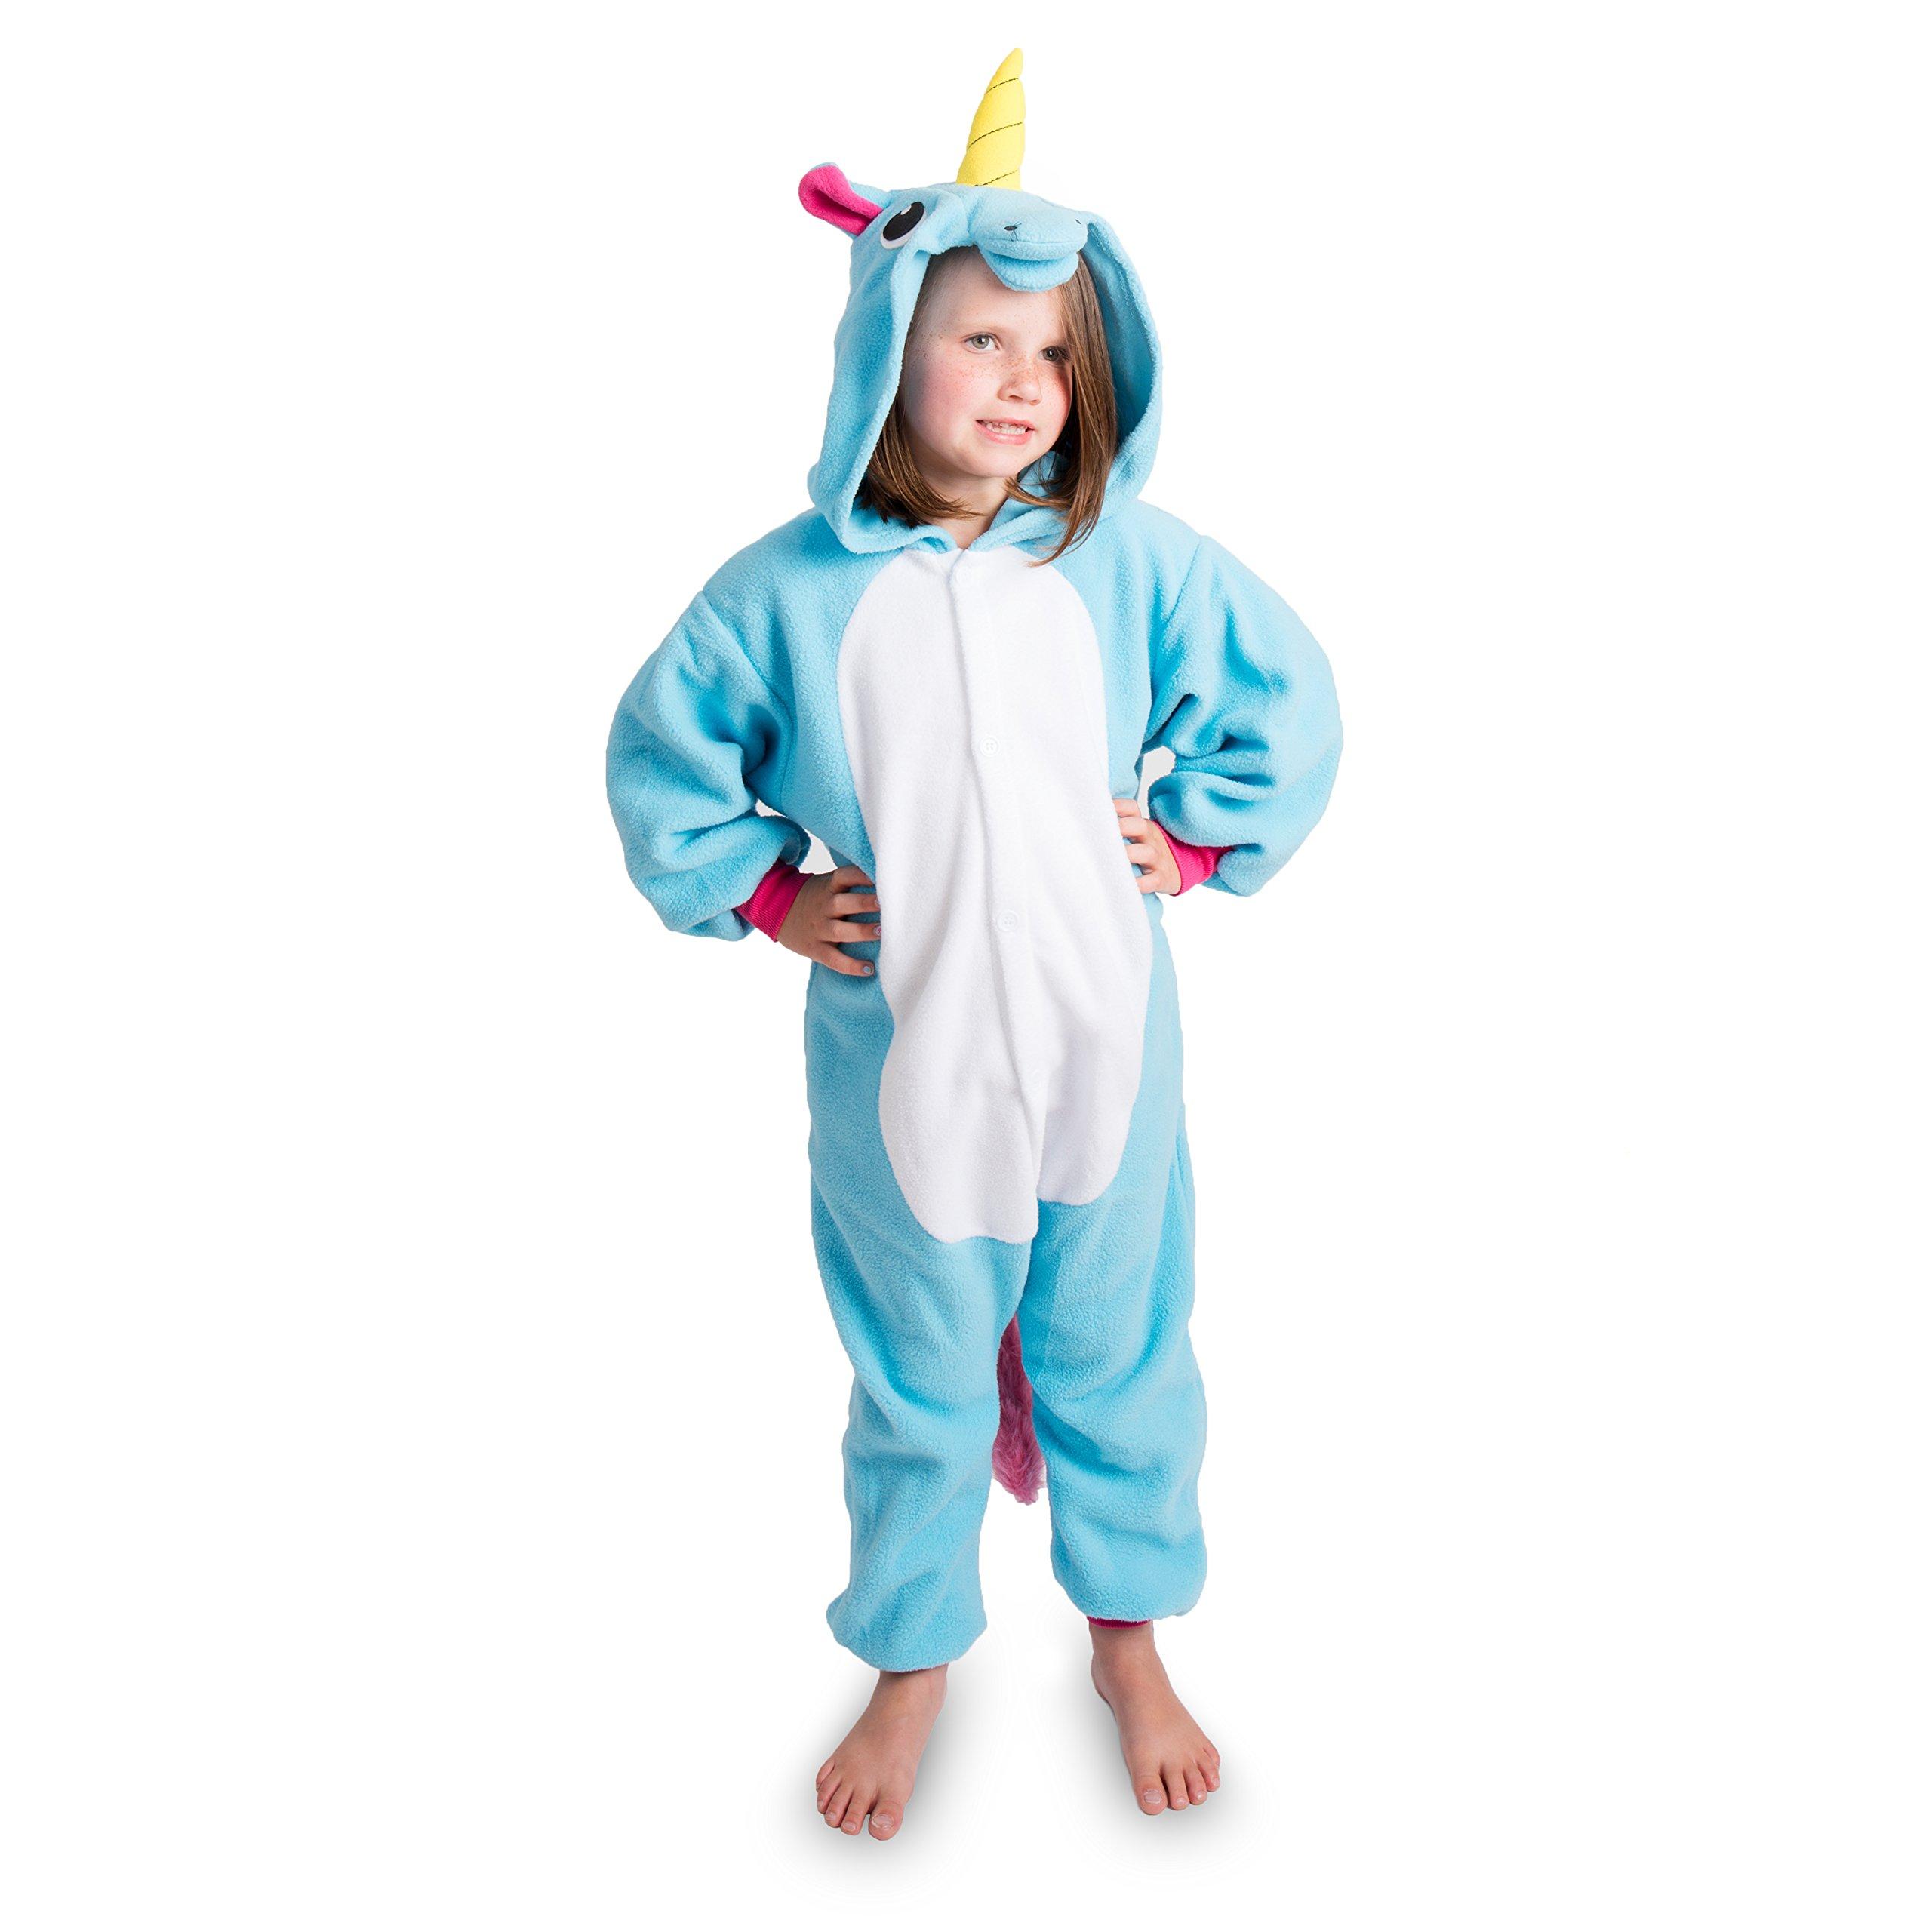 Emolly Fashion Kids Animal Unicorn Pajama Onesie - Soft and Comfortable with Pockets (5, Blue)